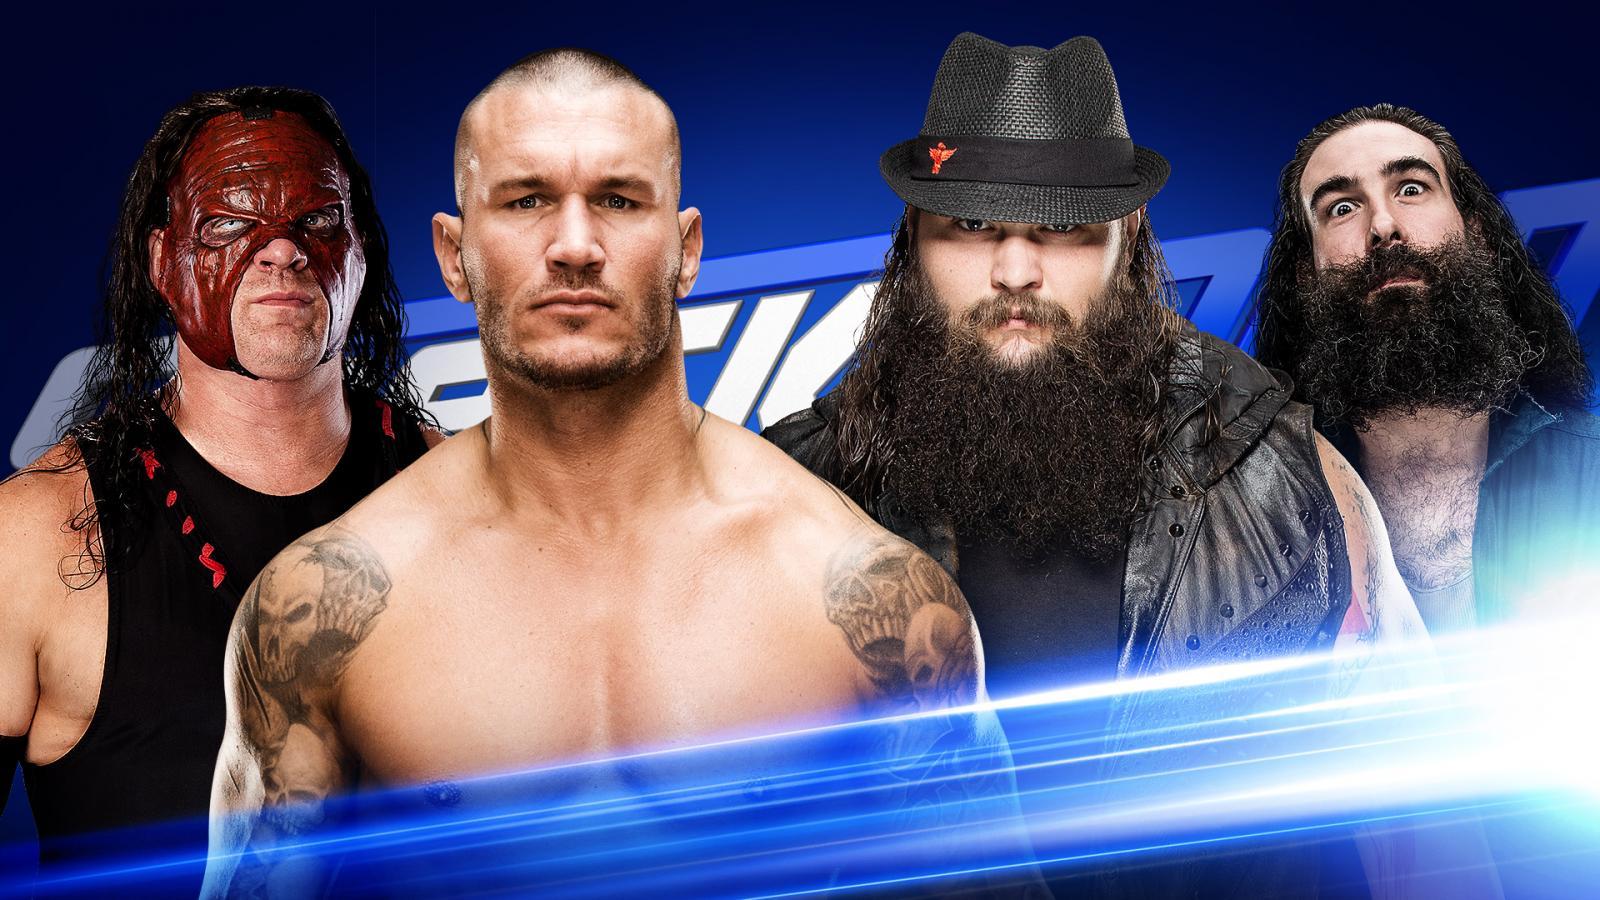 WWE SmackDown - 11/10/16